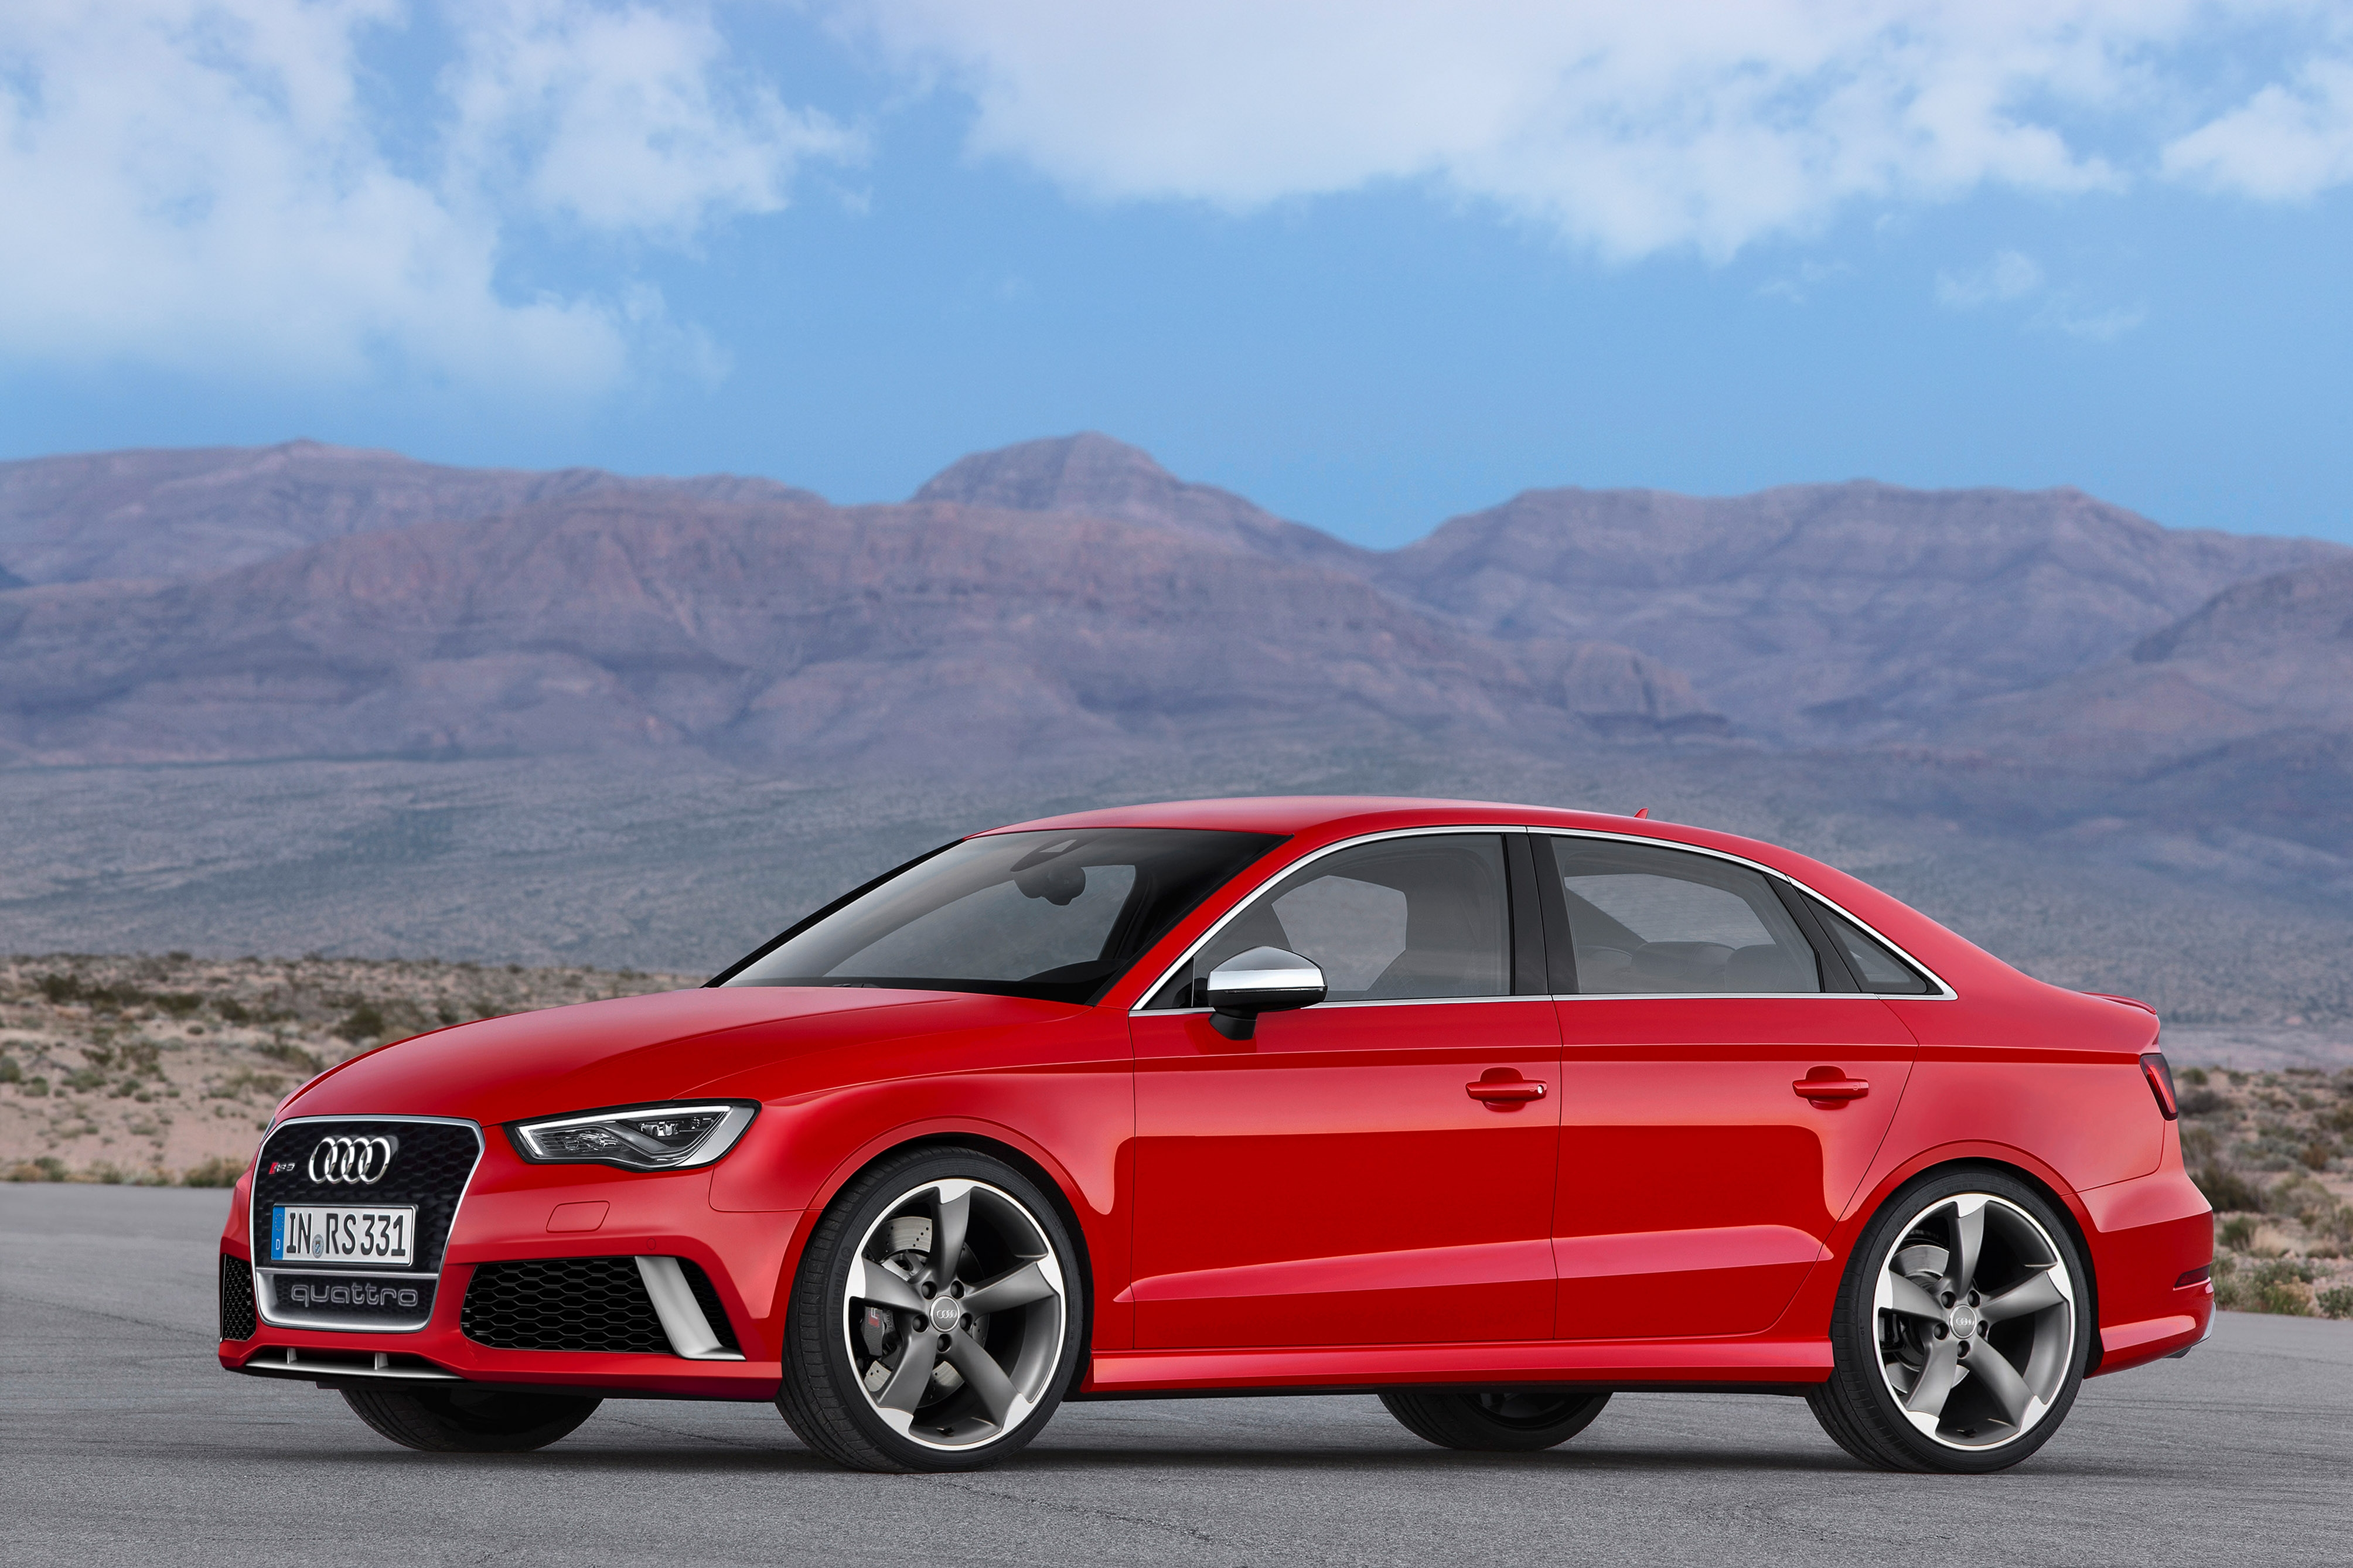 Eindelijk bevestigd: Audi RS3 Limousine